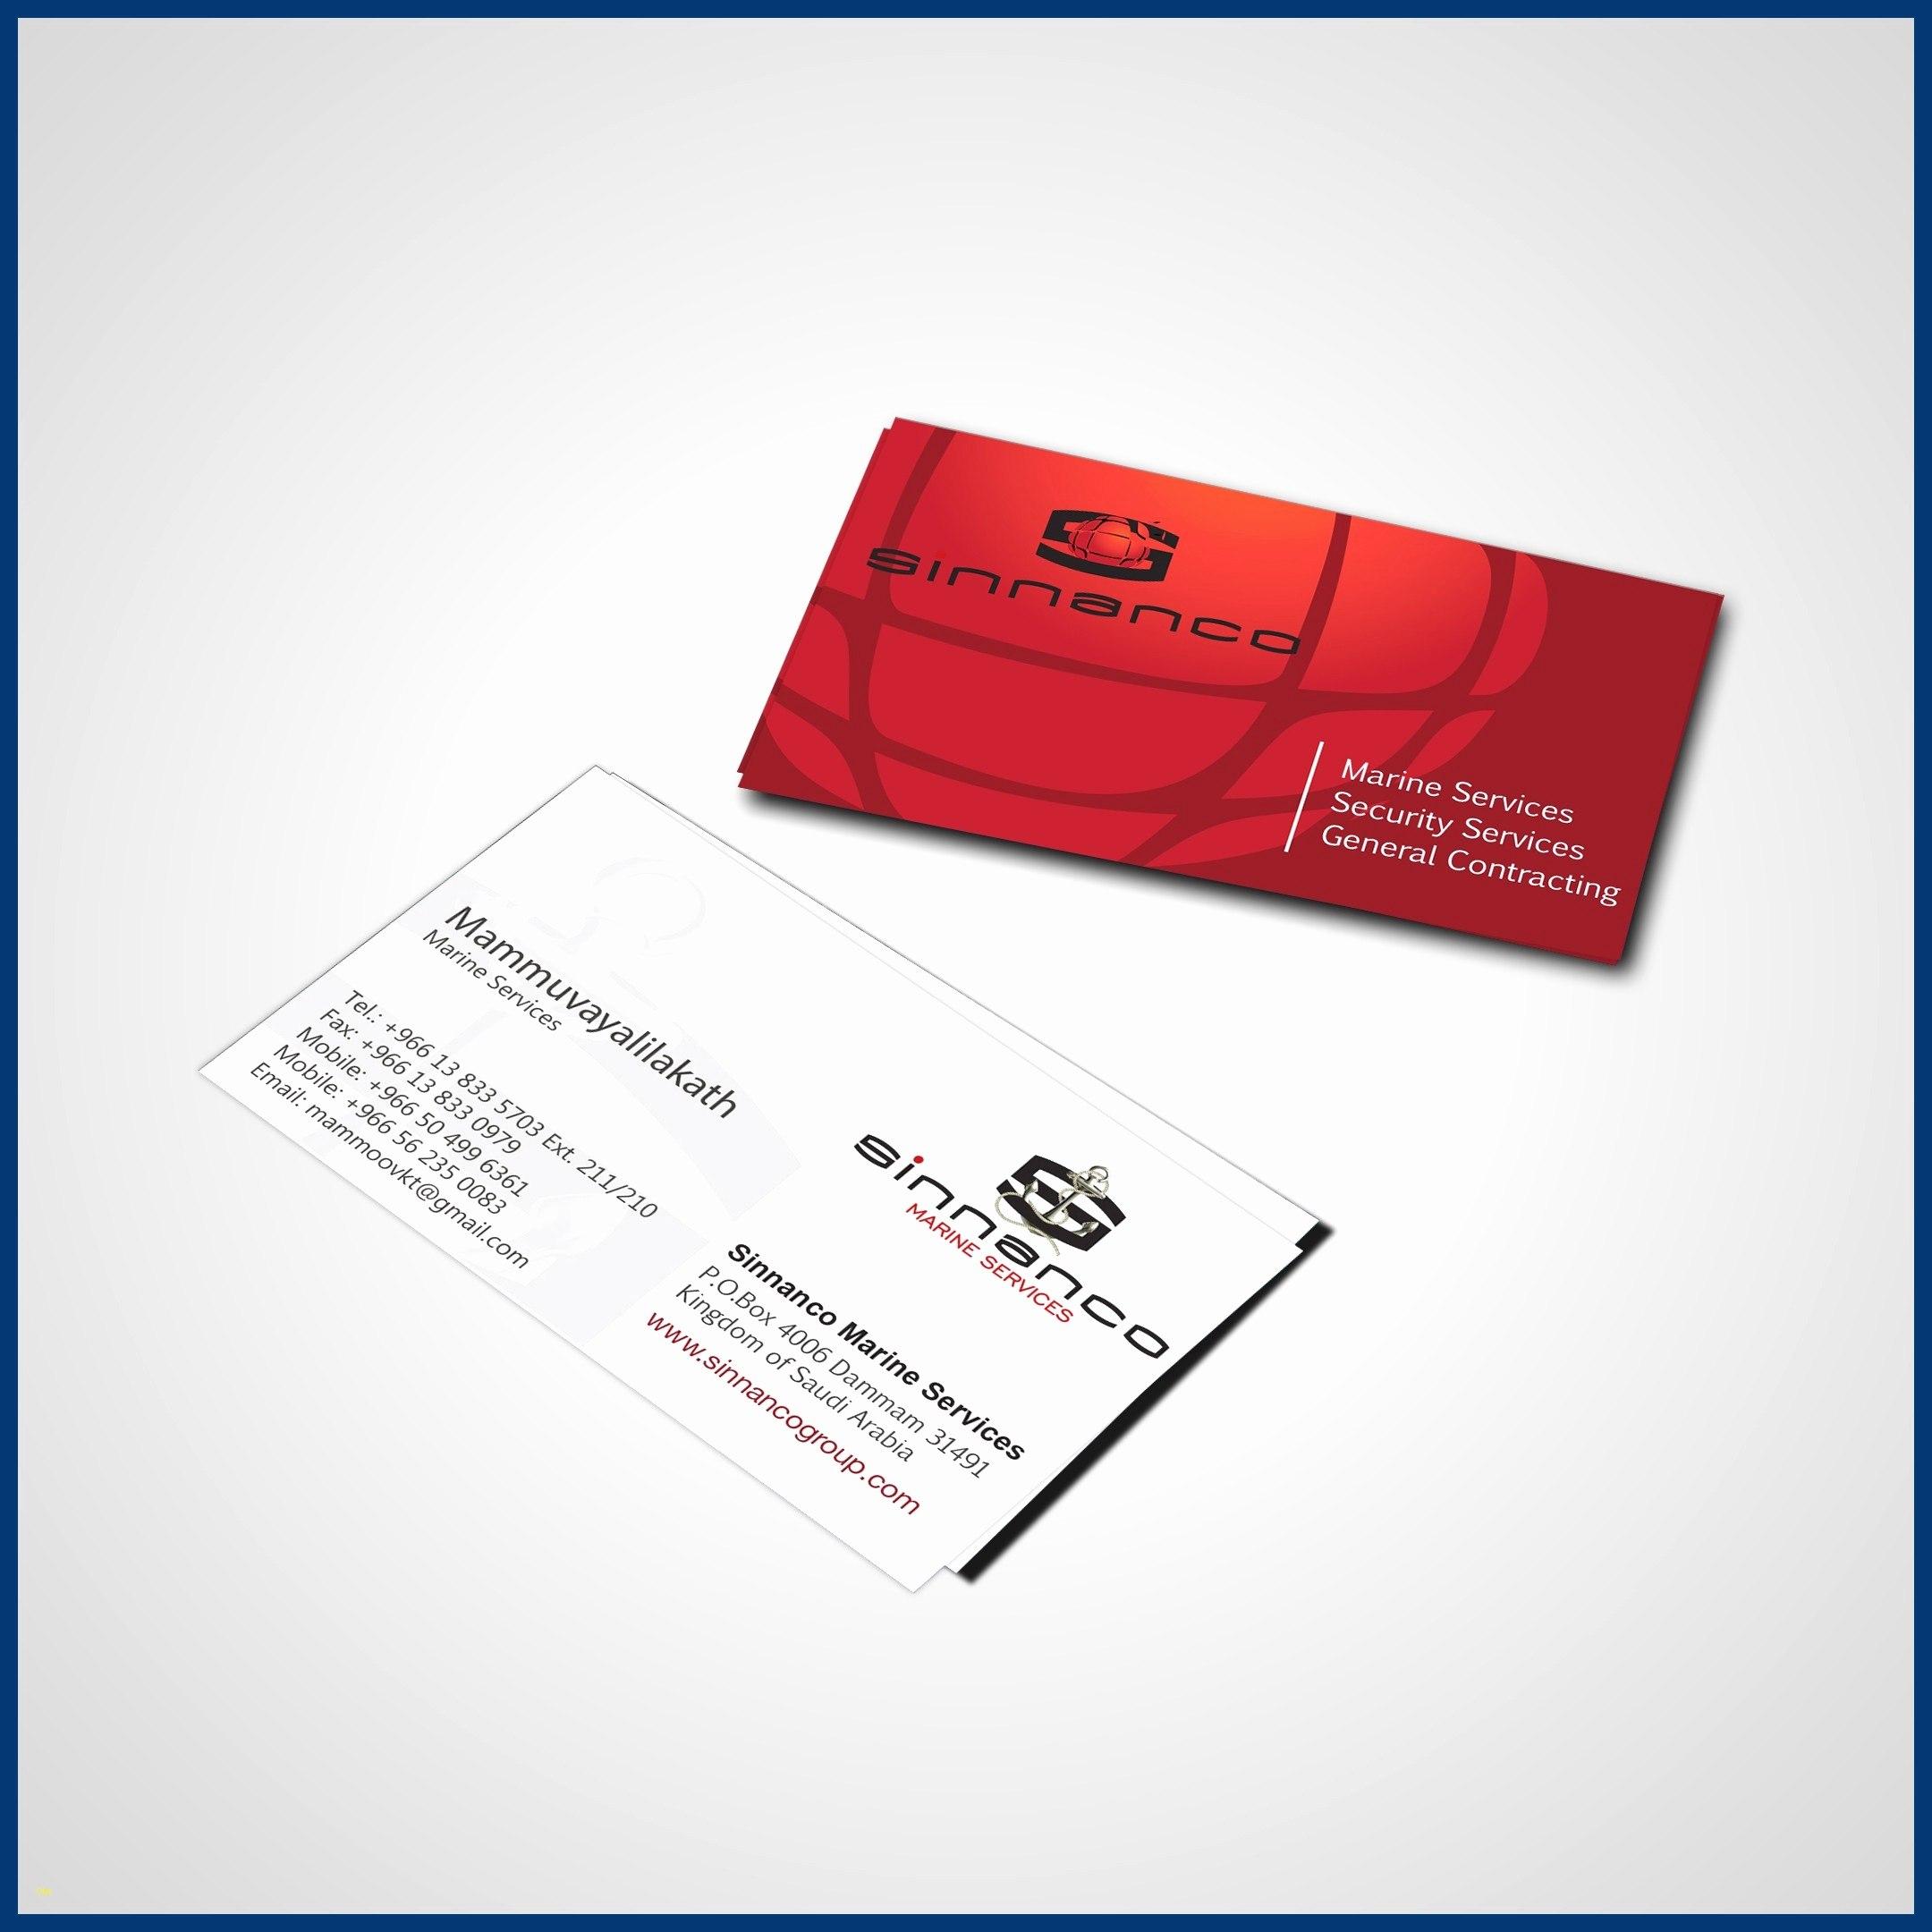 Beautiful Business Cards Office Depot  Hydraexecutives Regarding Office Depot Business Card Template